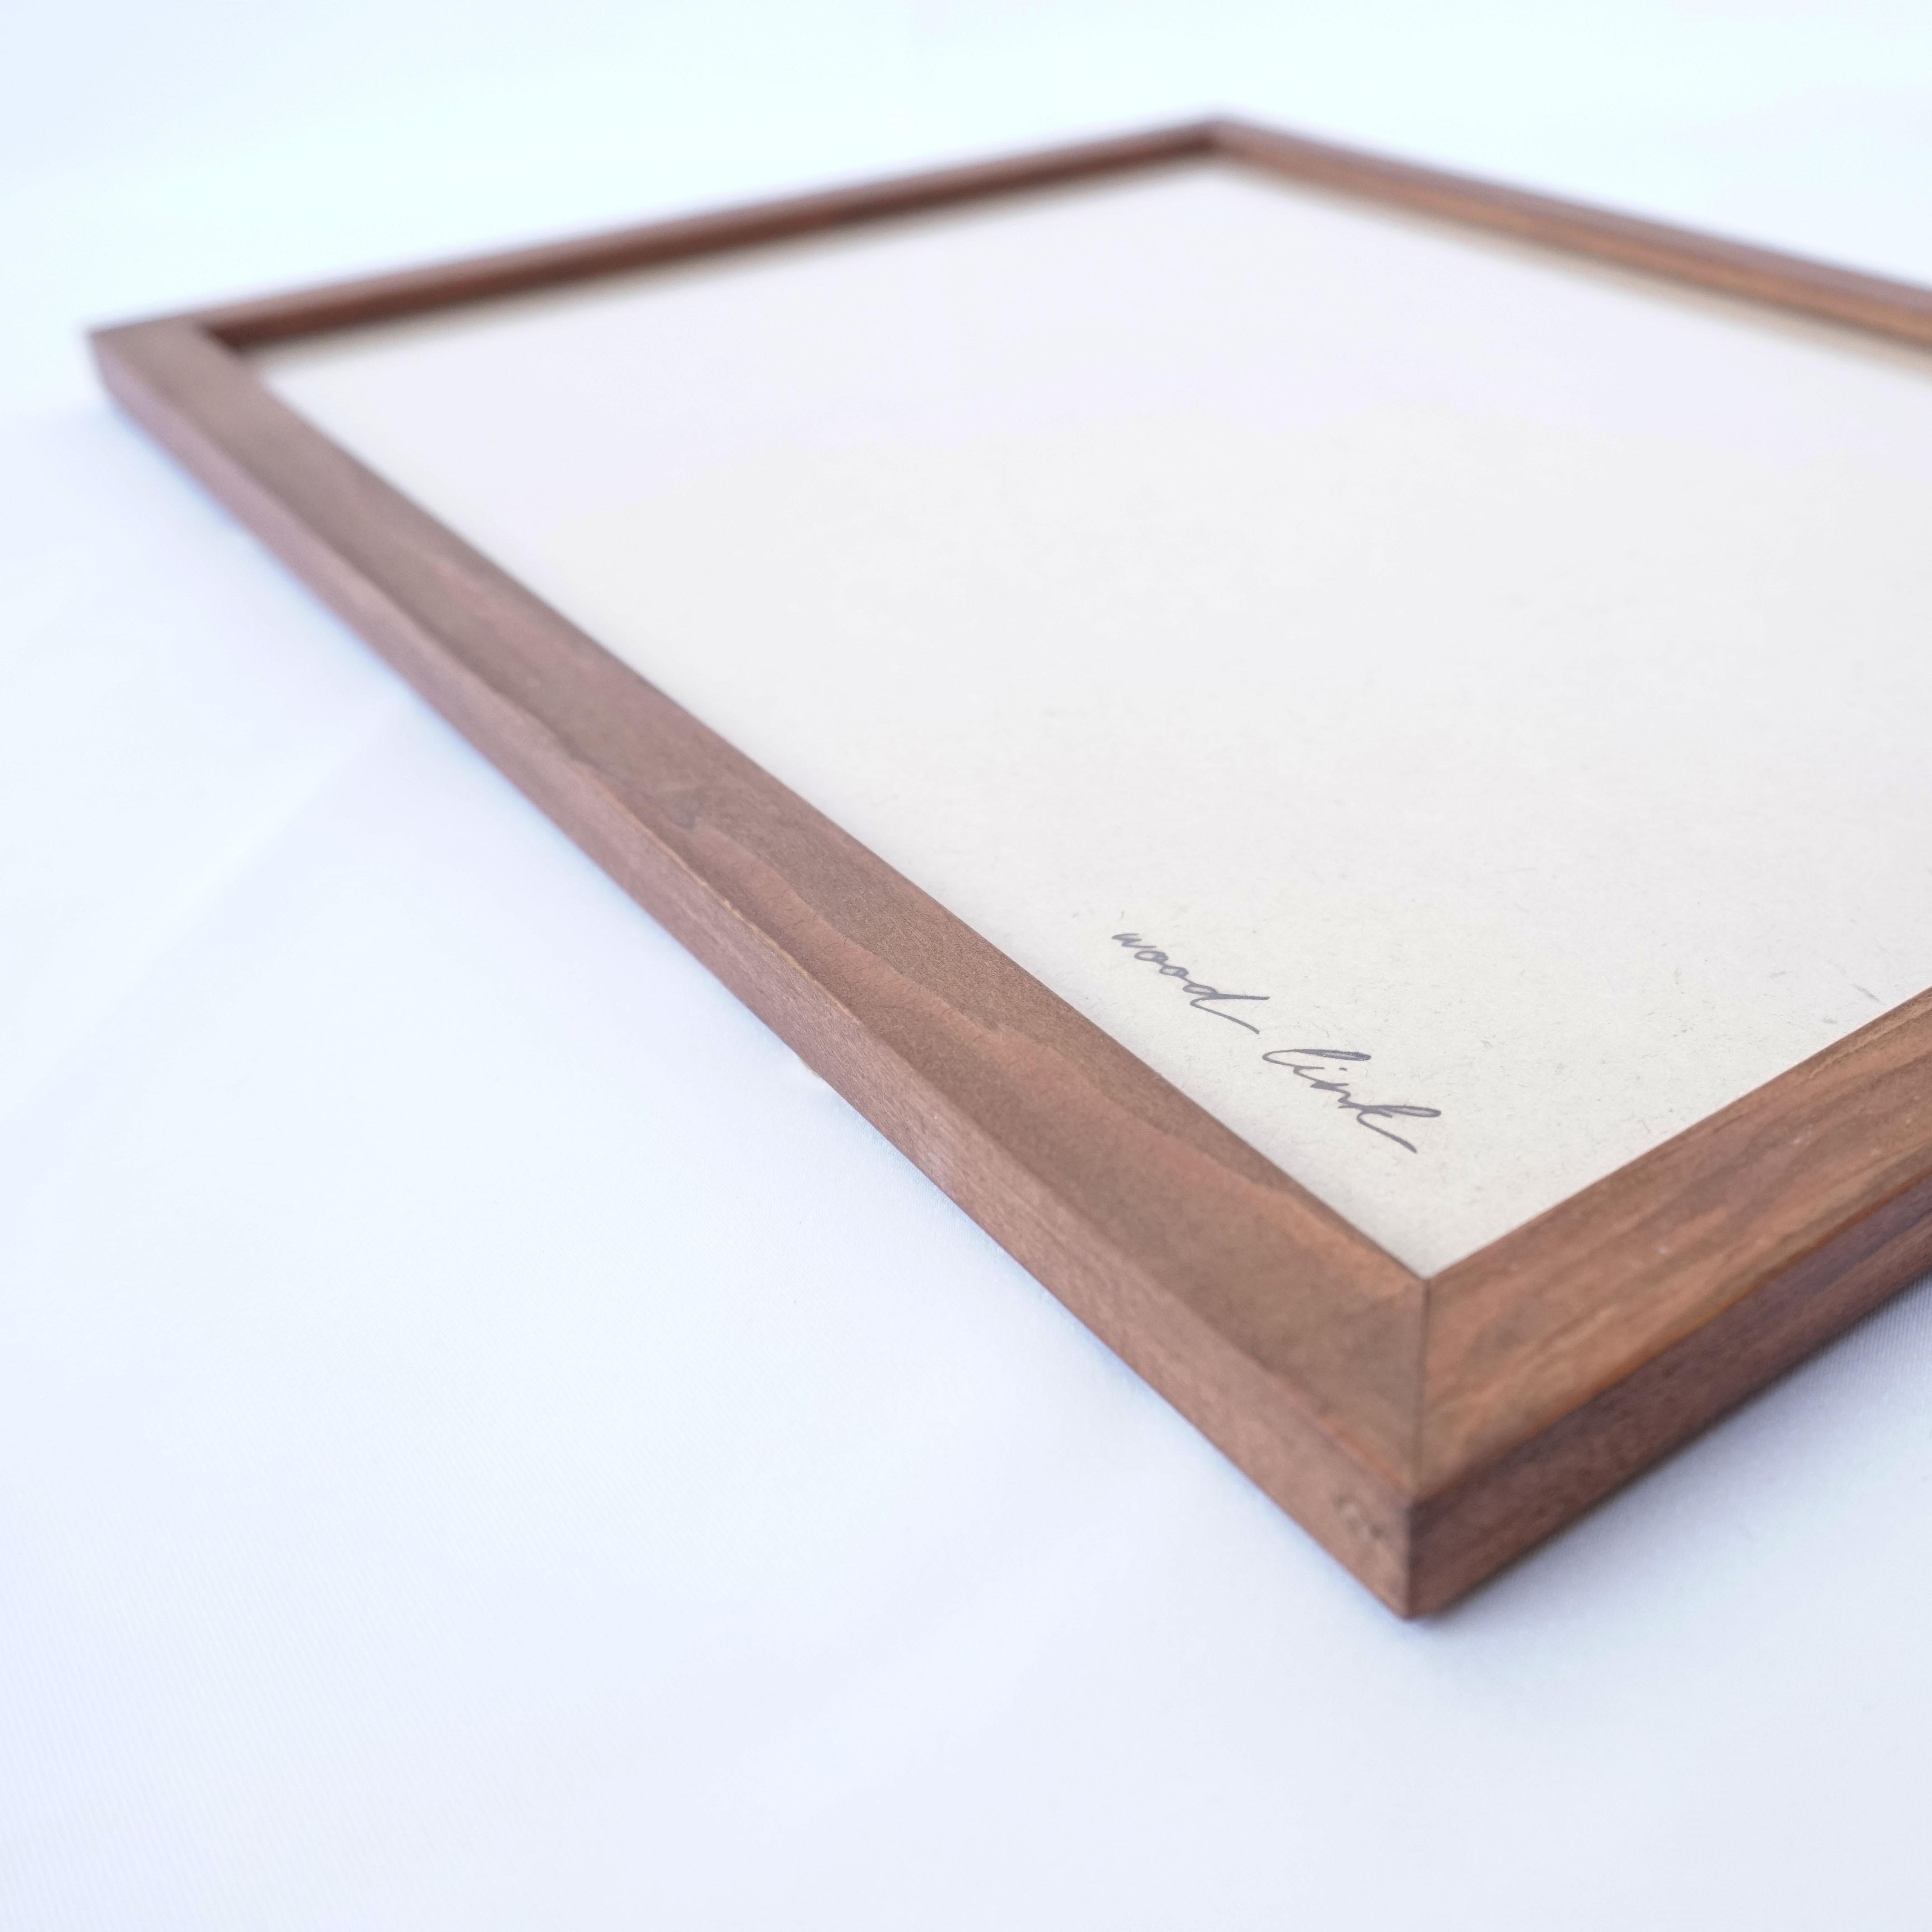 Simple Flame (A4) beimatsu